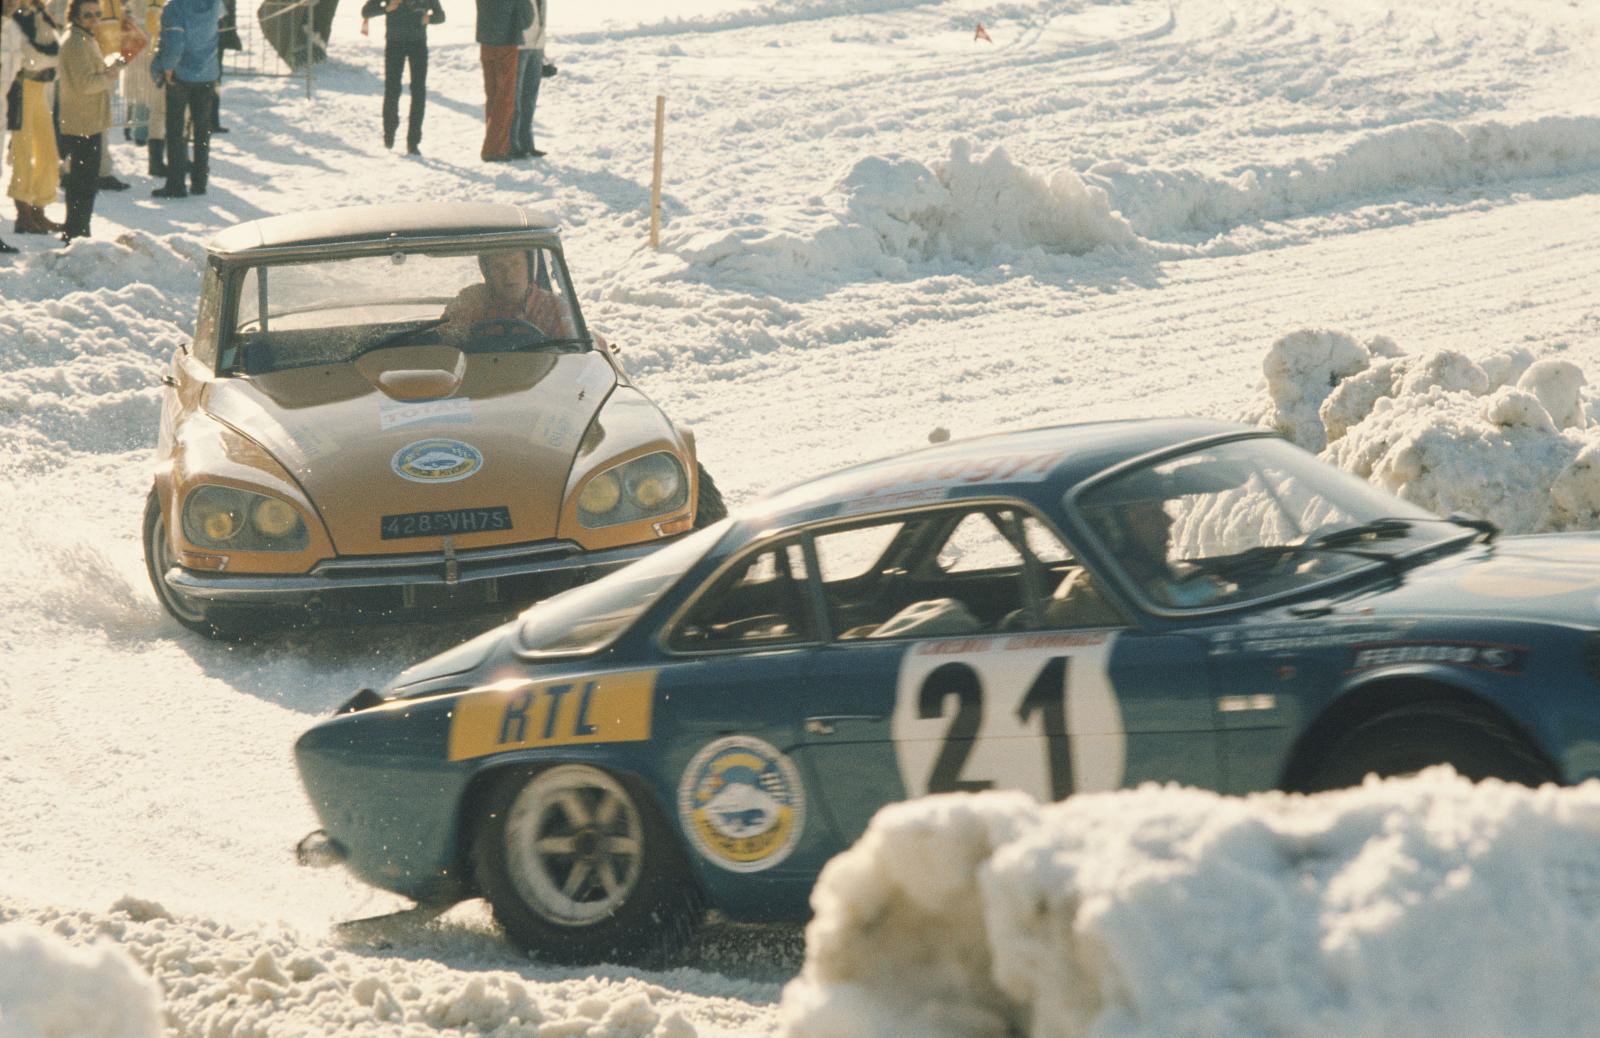 Ronda de inverno de Chamonix - DS 21 - 1972